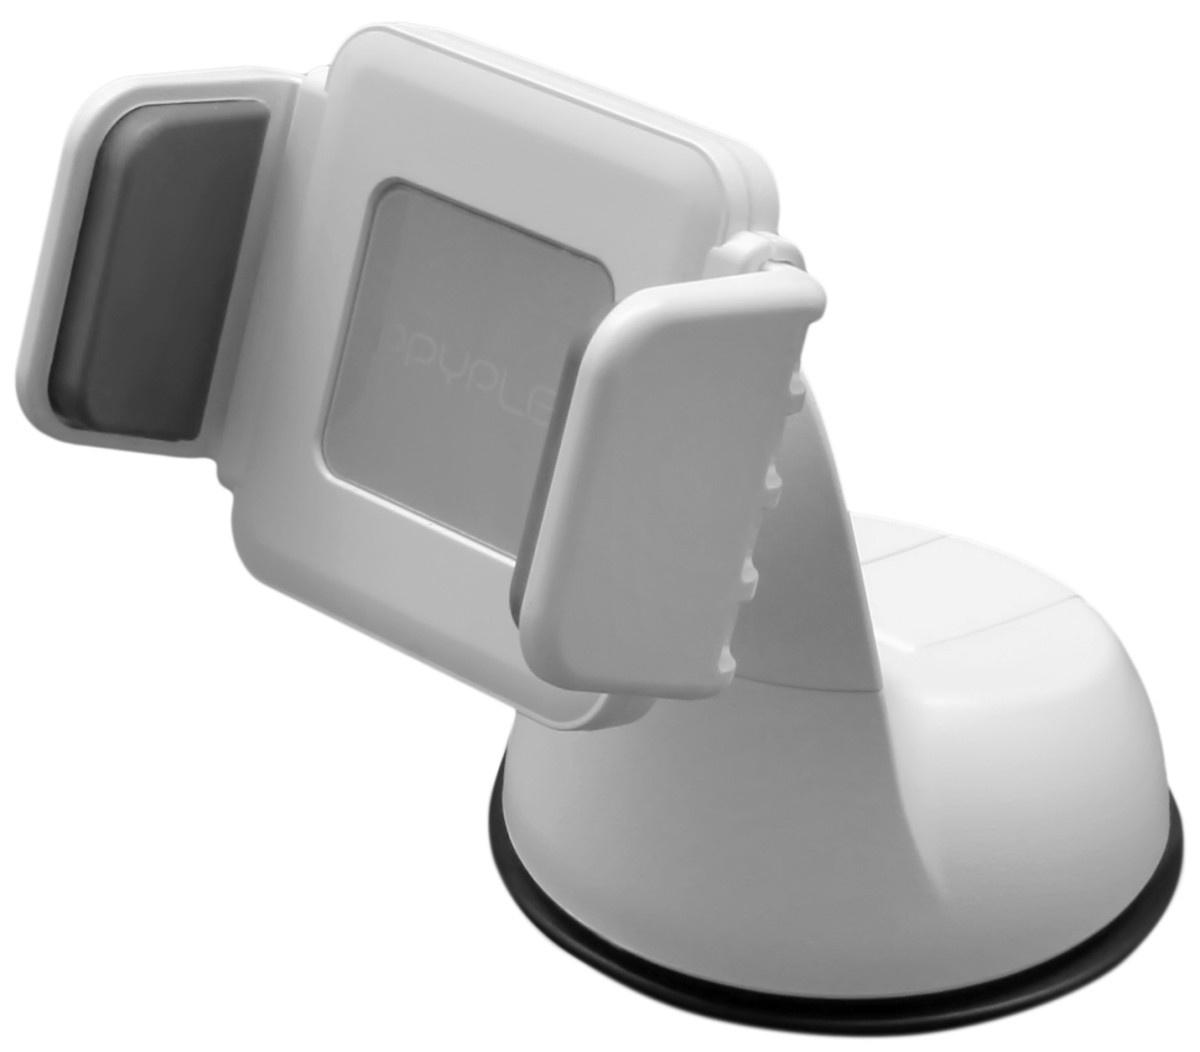 автомобильный держатель для смартфона Ppyple Dash-R5 white